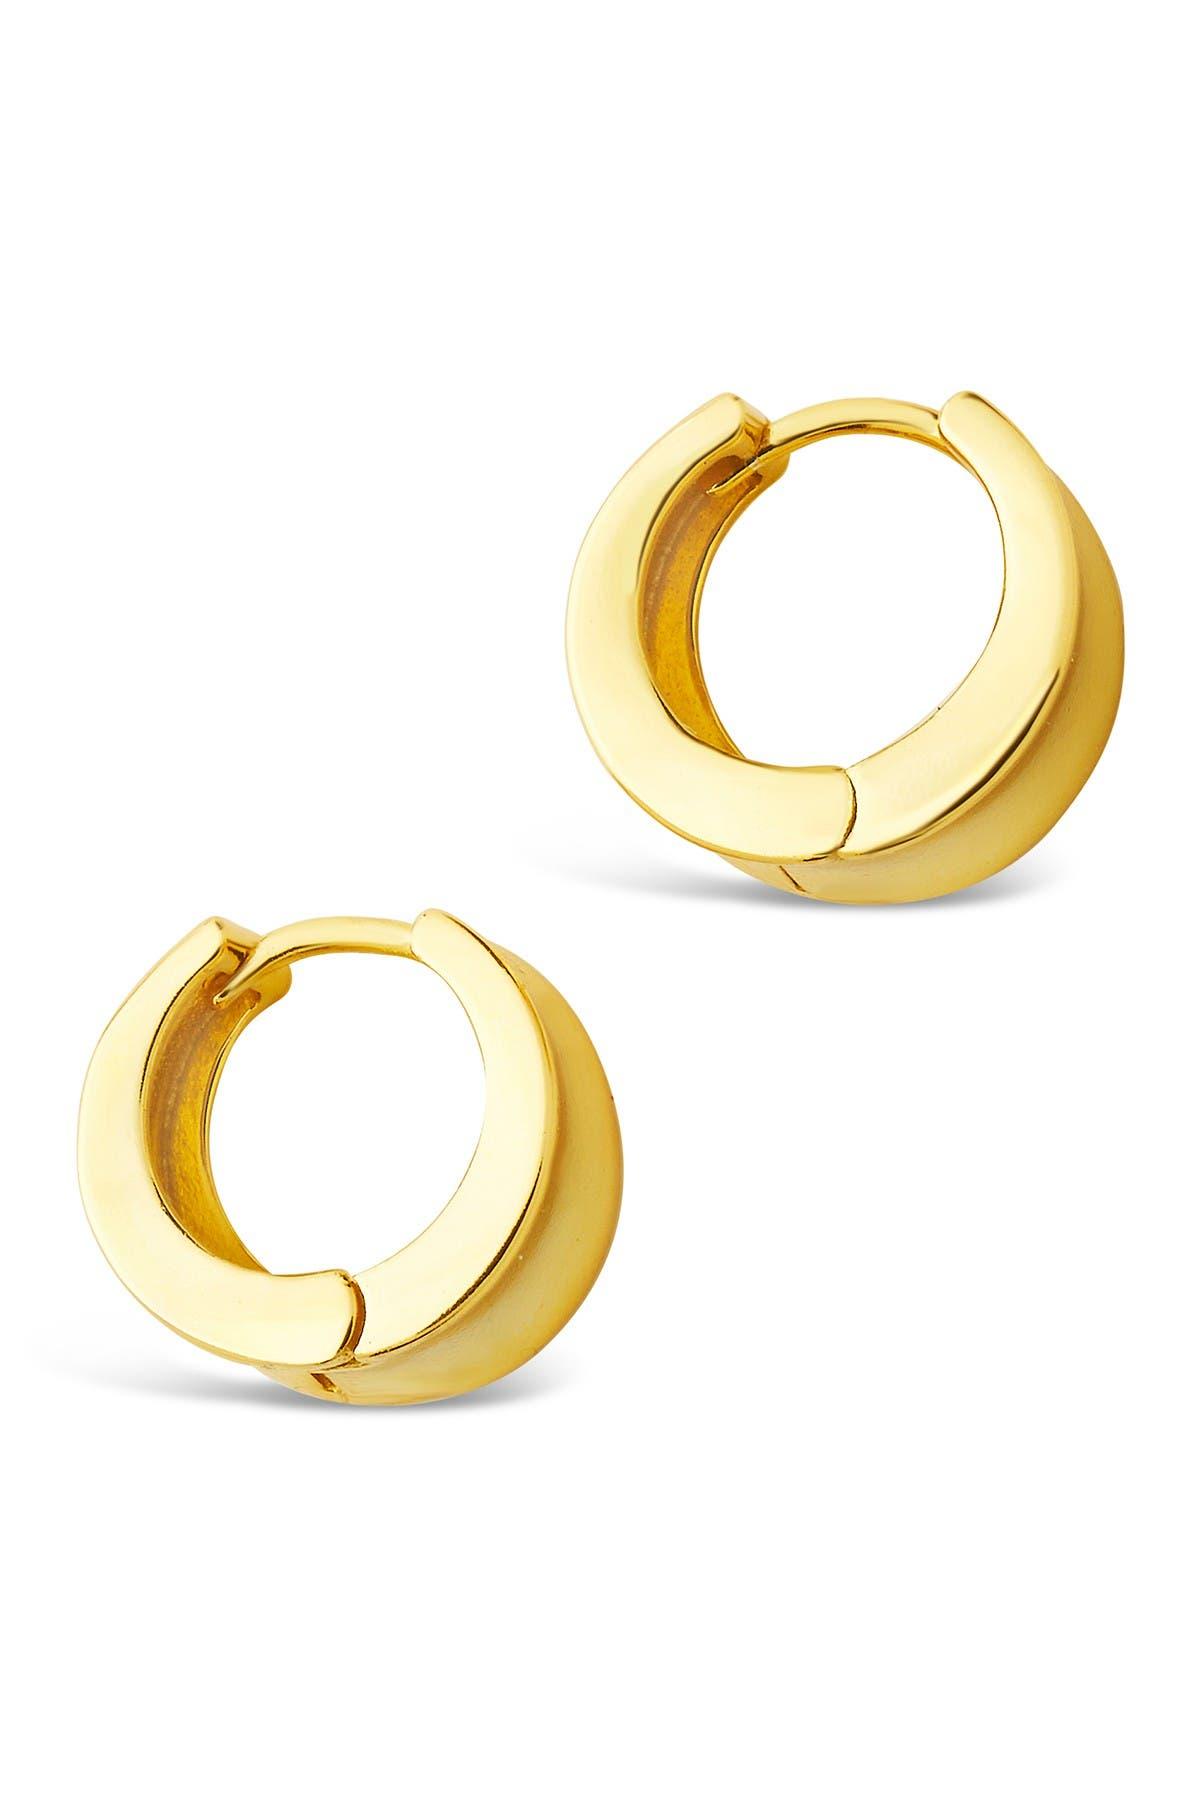 Yellow gold finish  huggie hoop created diamond earrings gift idea free postage